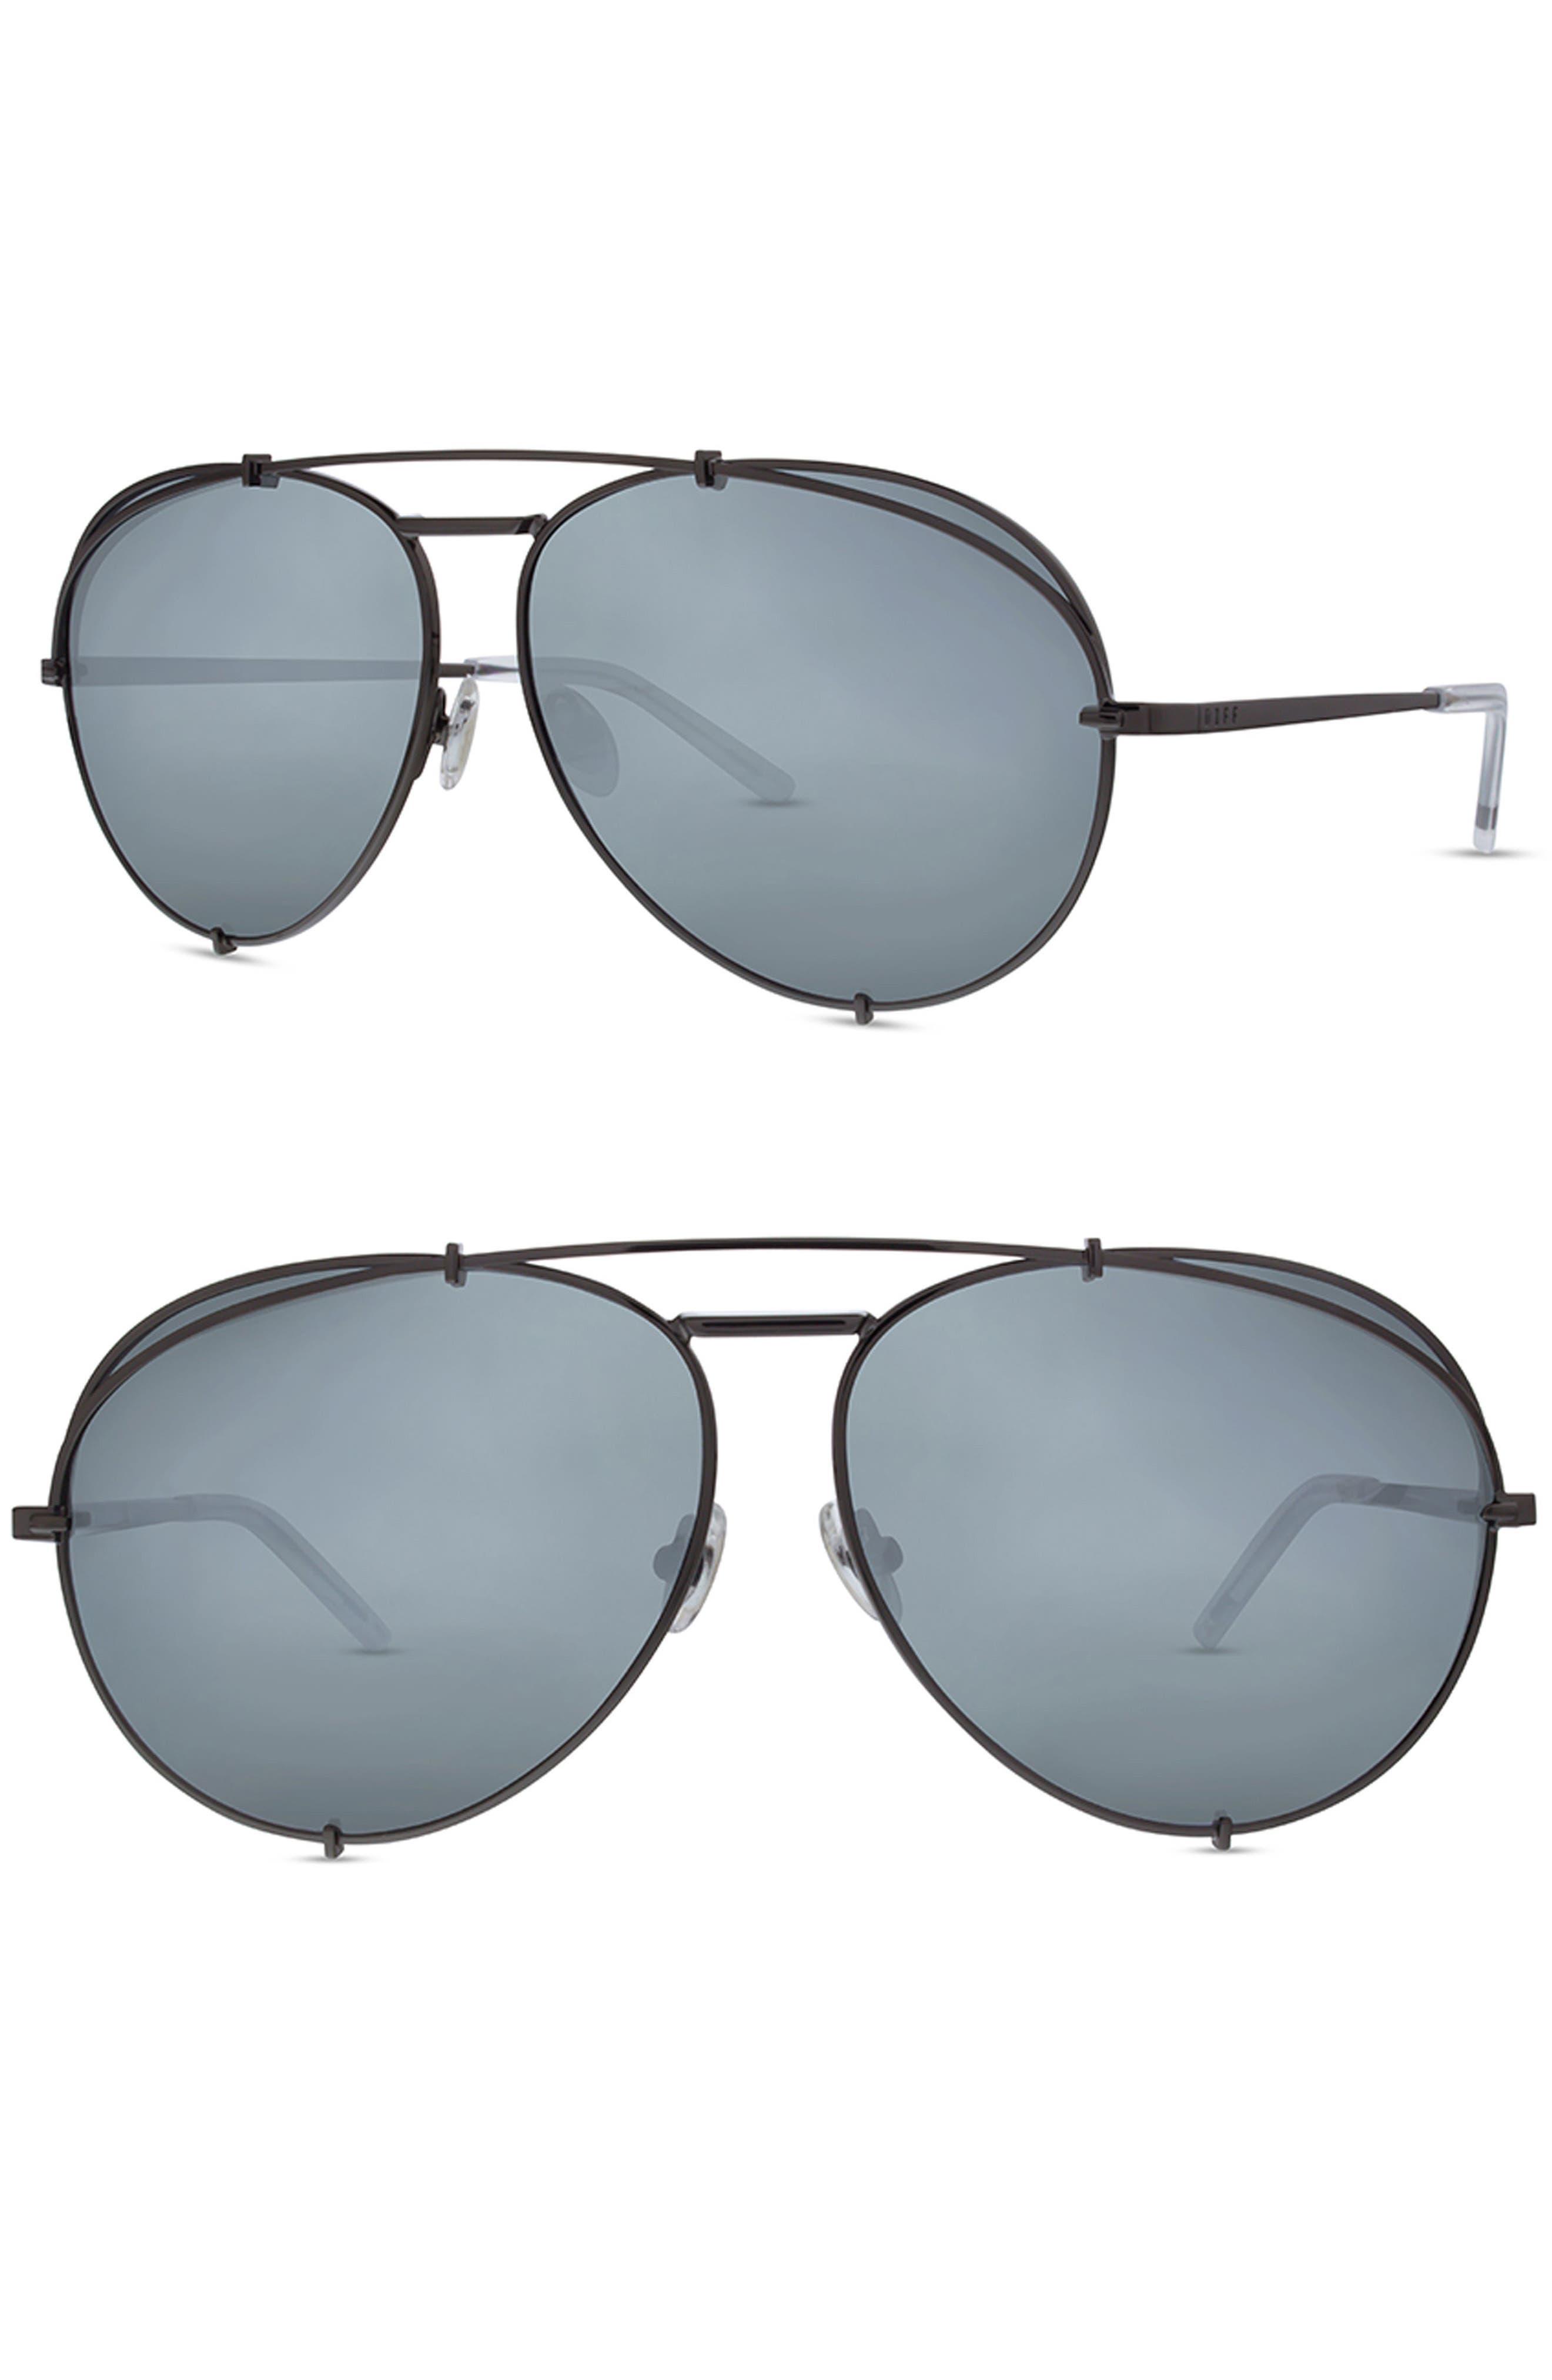 DIFF x Khloé Koko 63mm Oversize Aviator Sunglasses